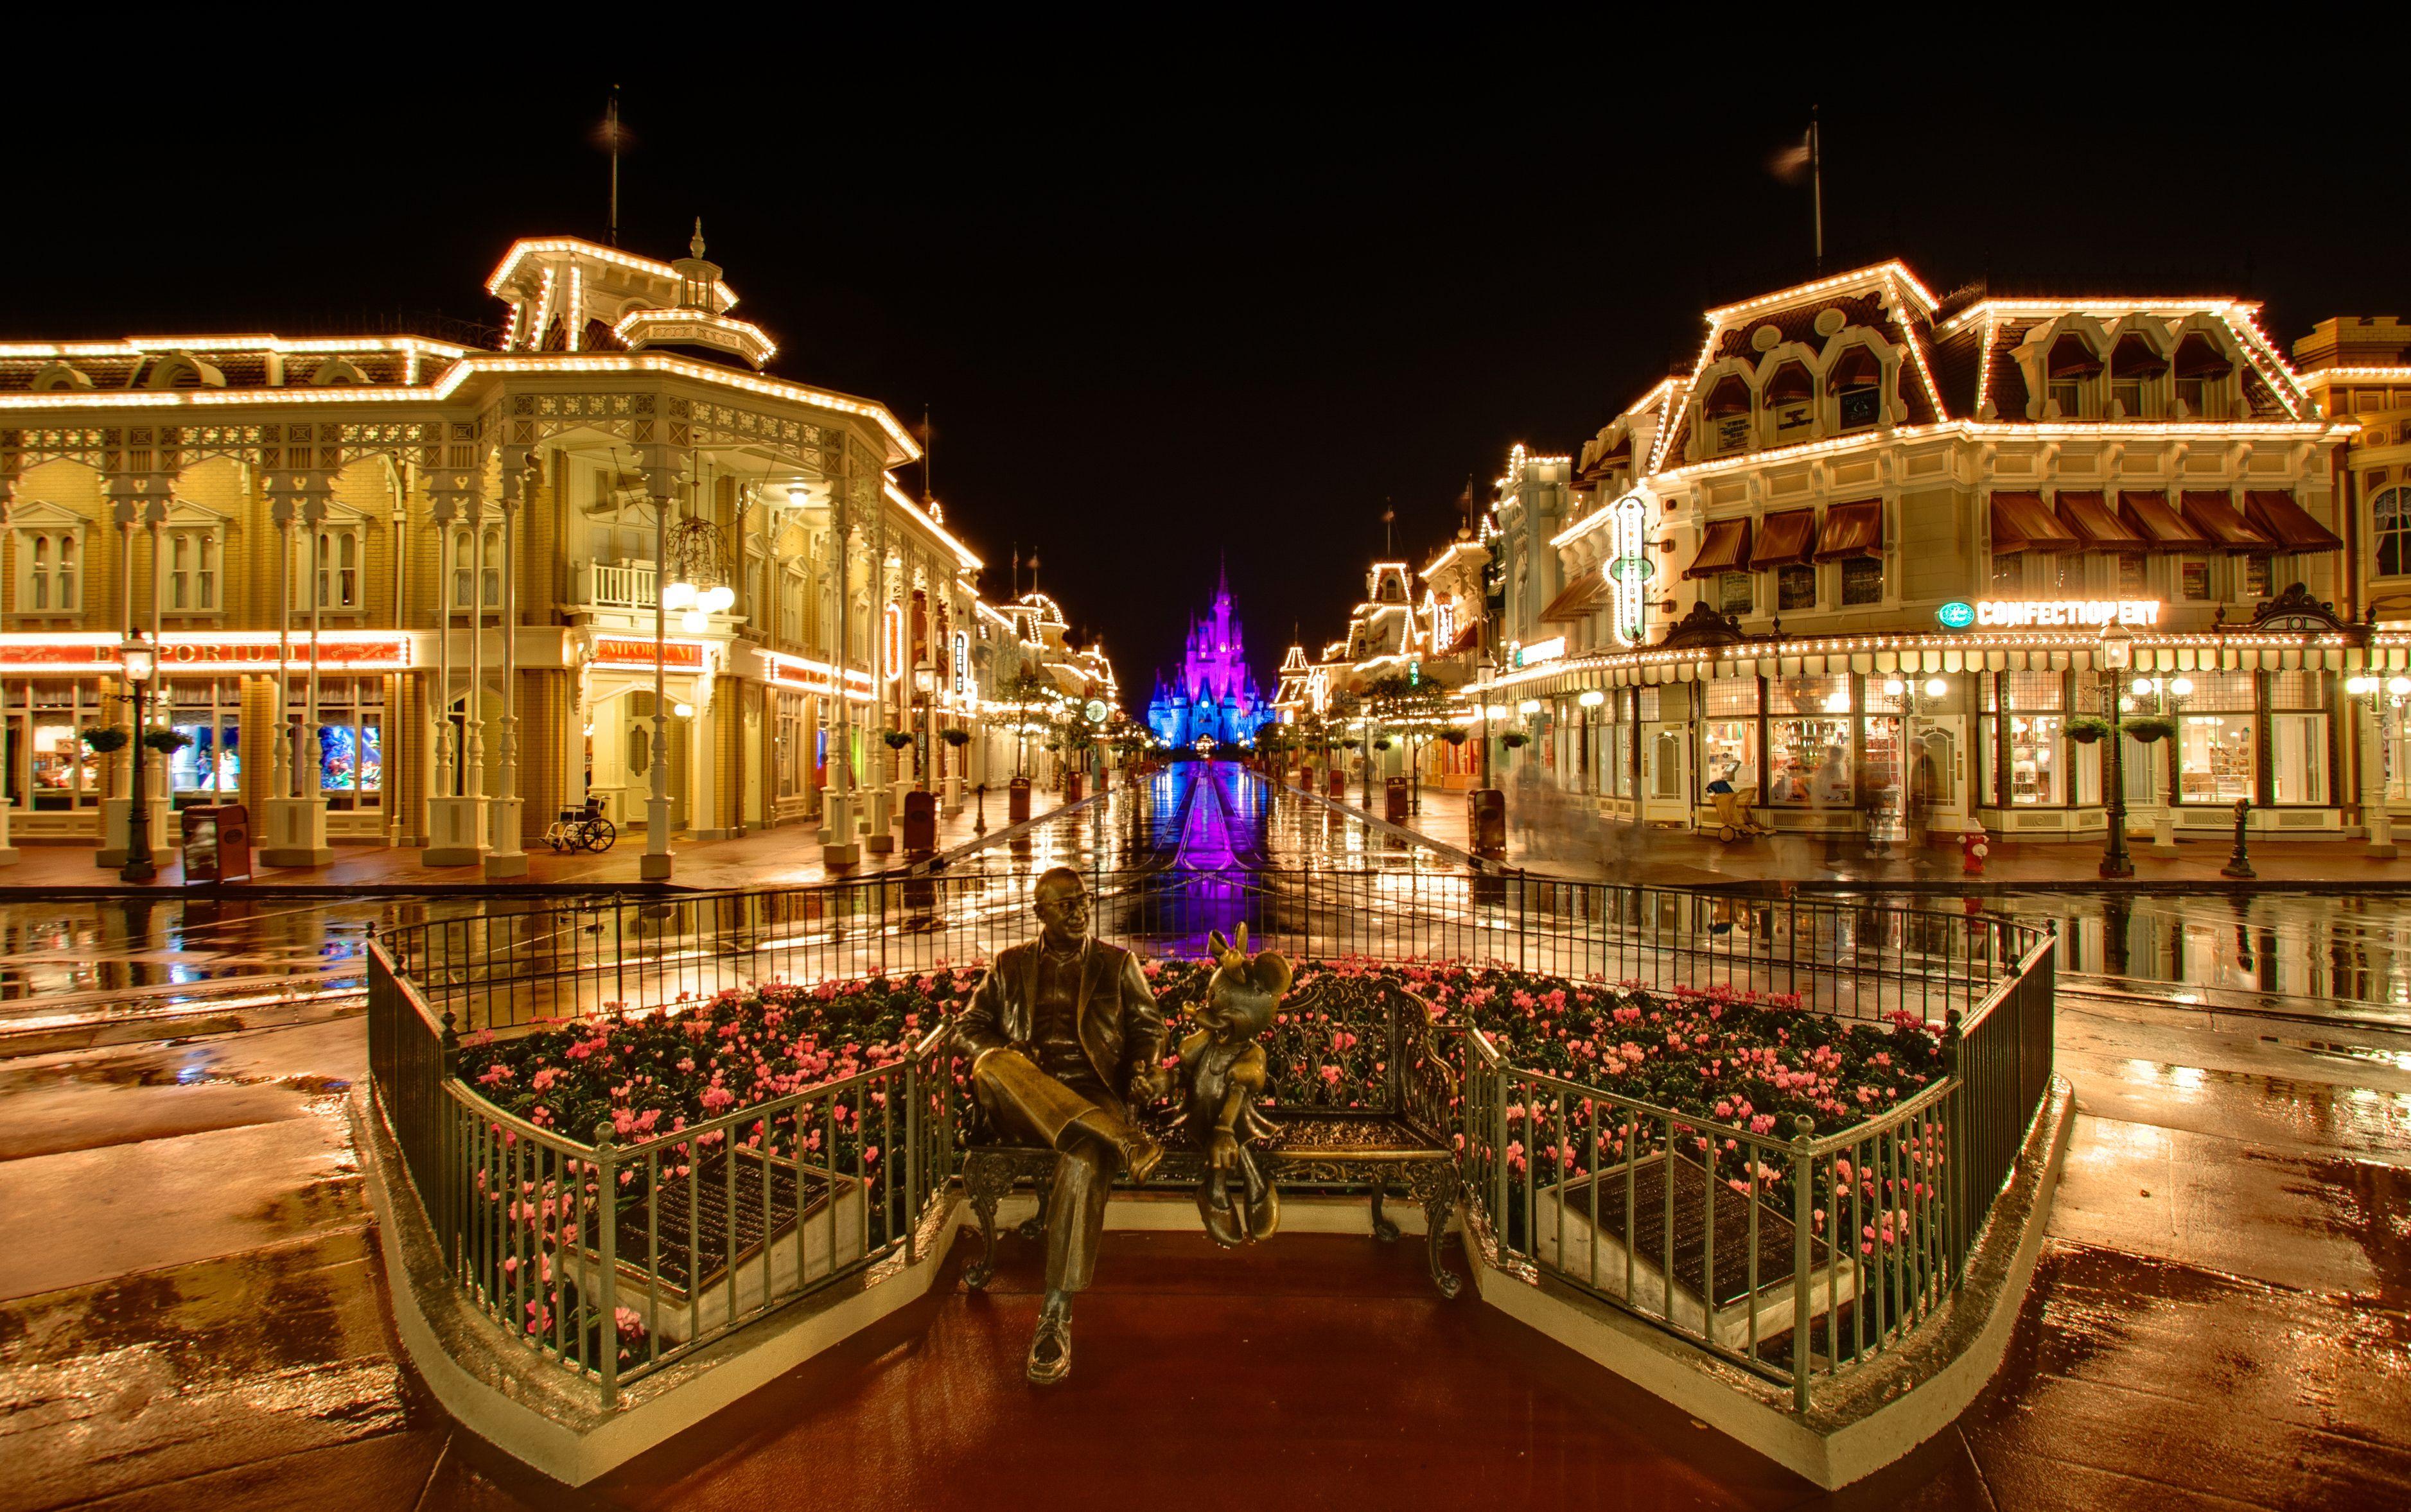 Magic Kingdom's Main Street in the Rain